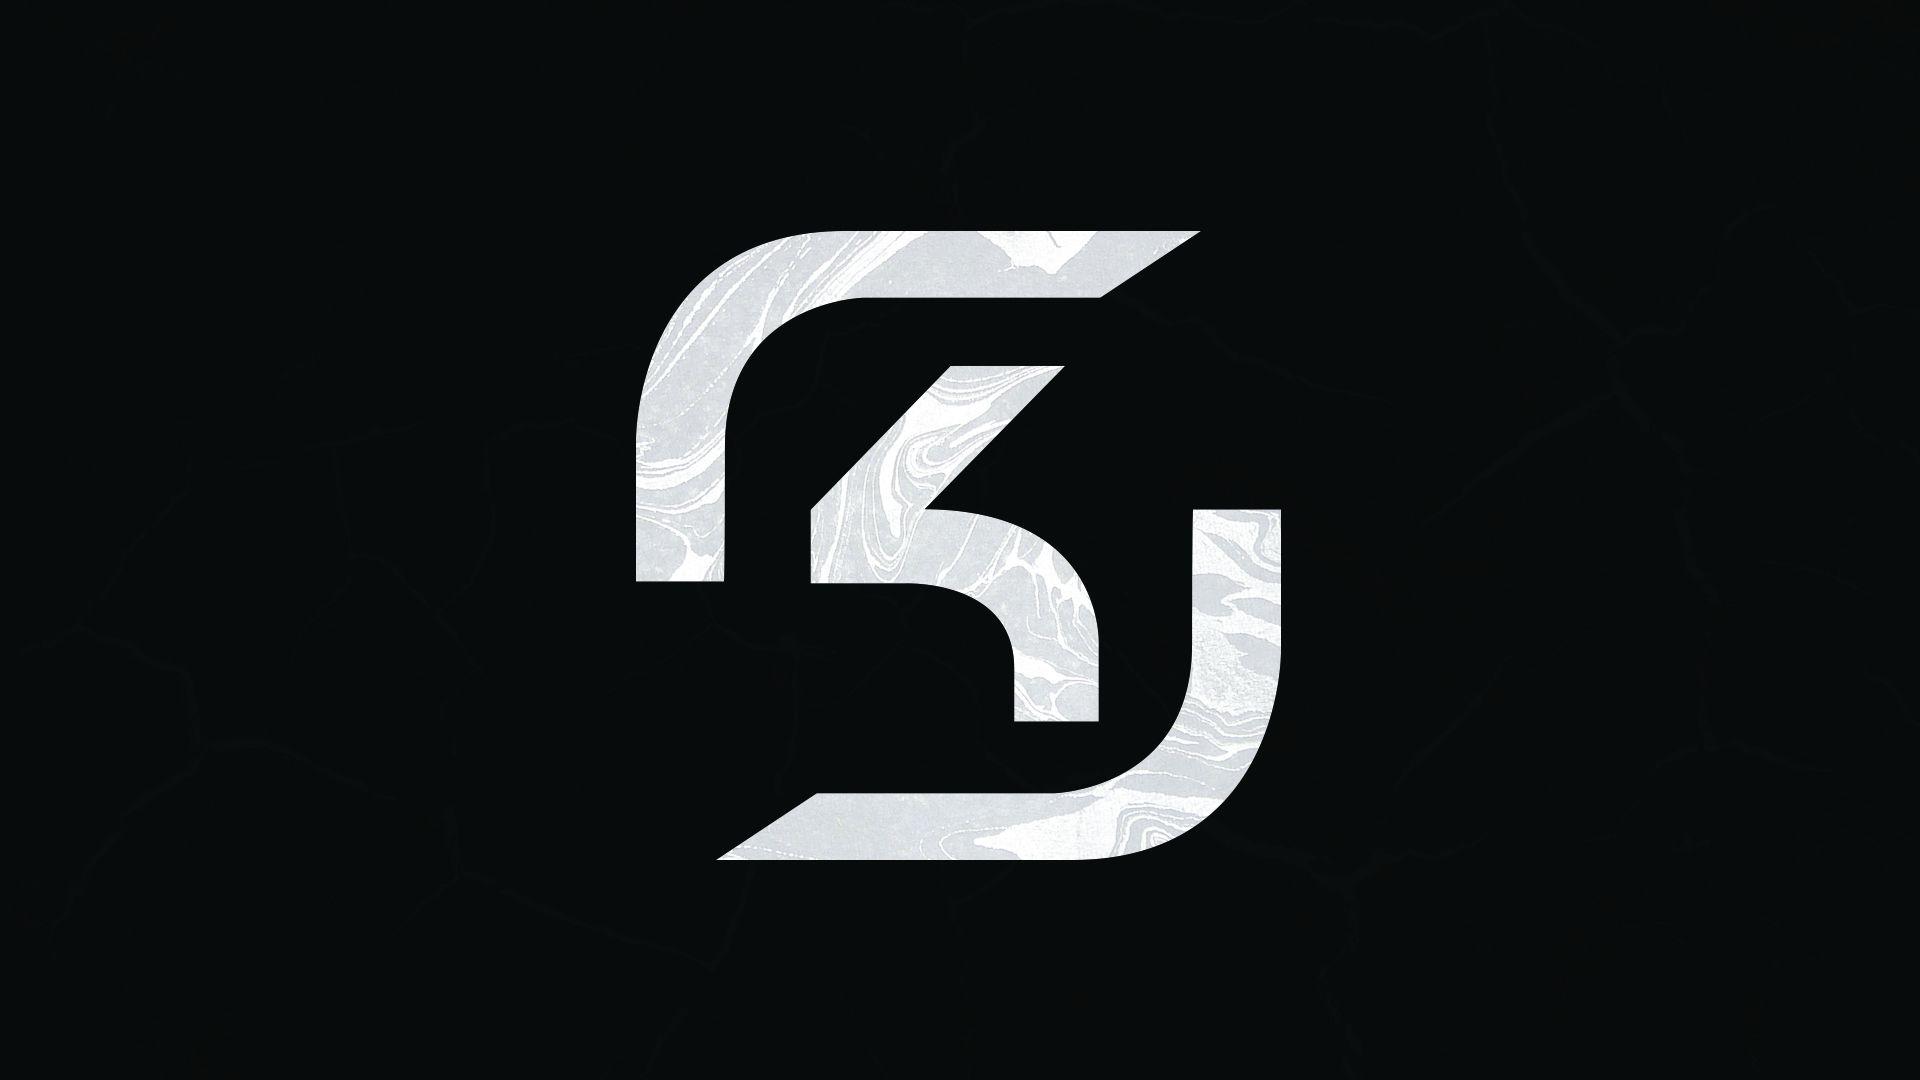 Logo natus vincere